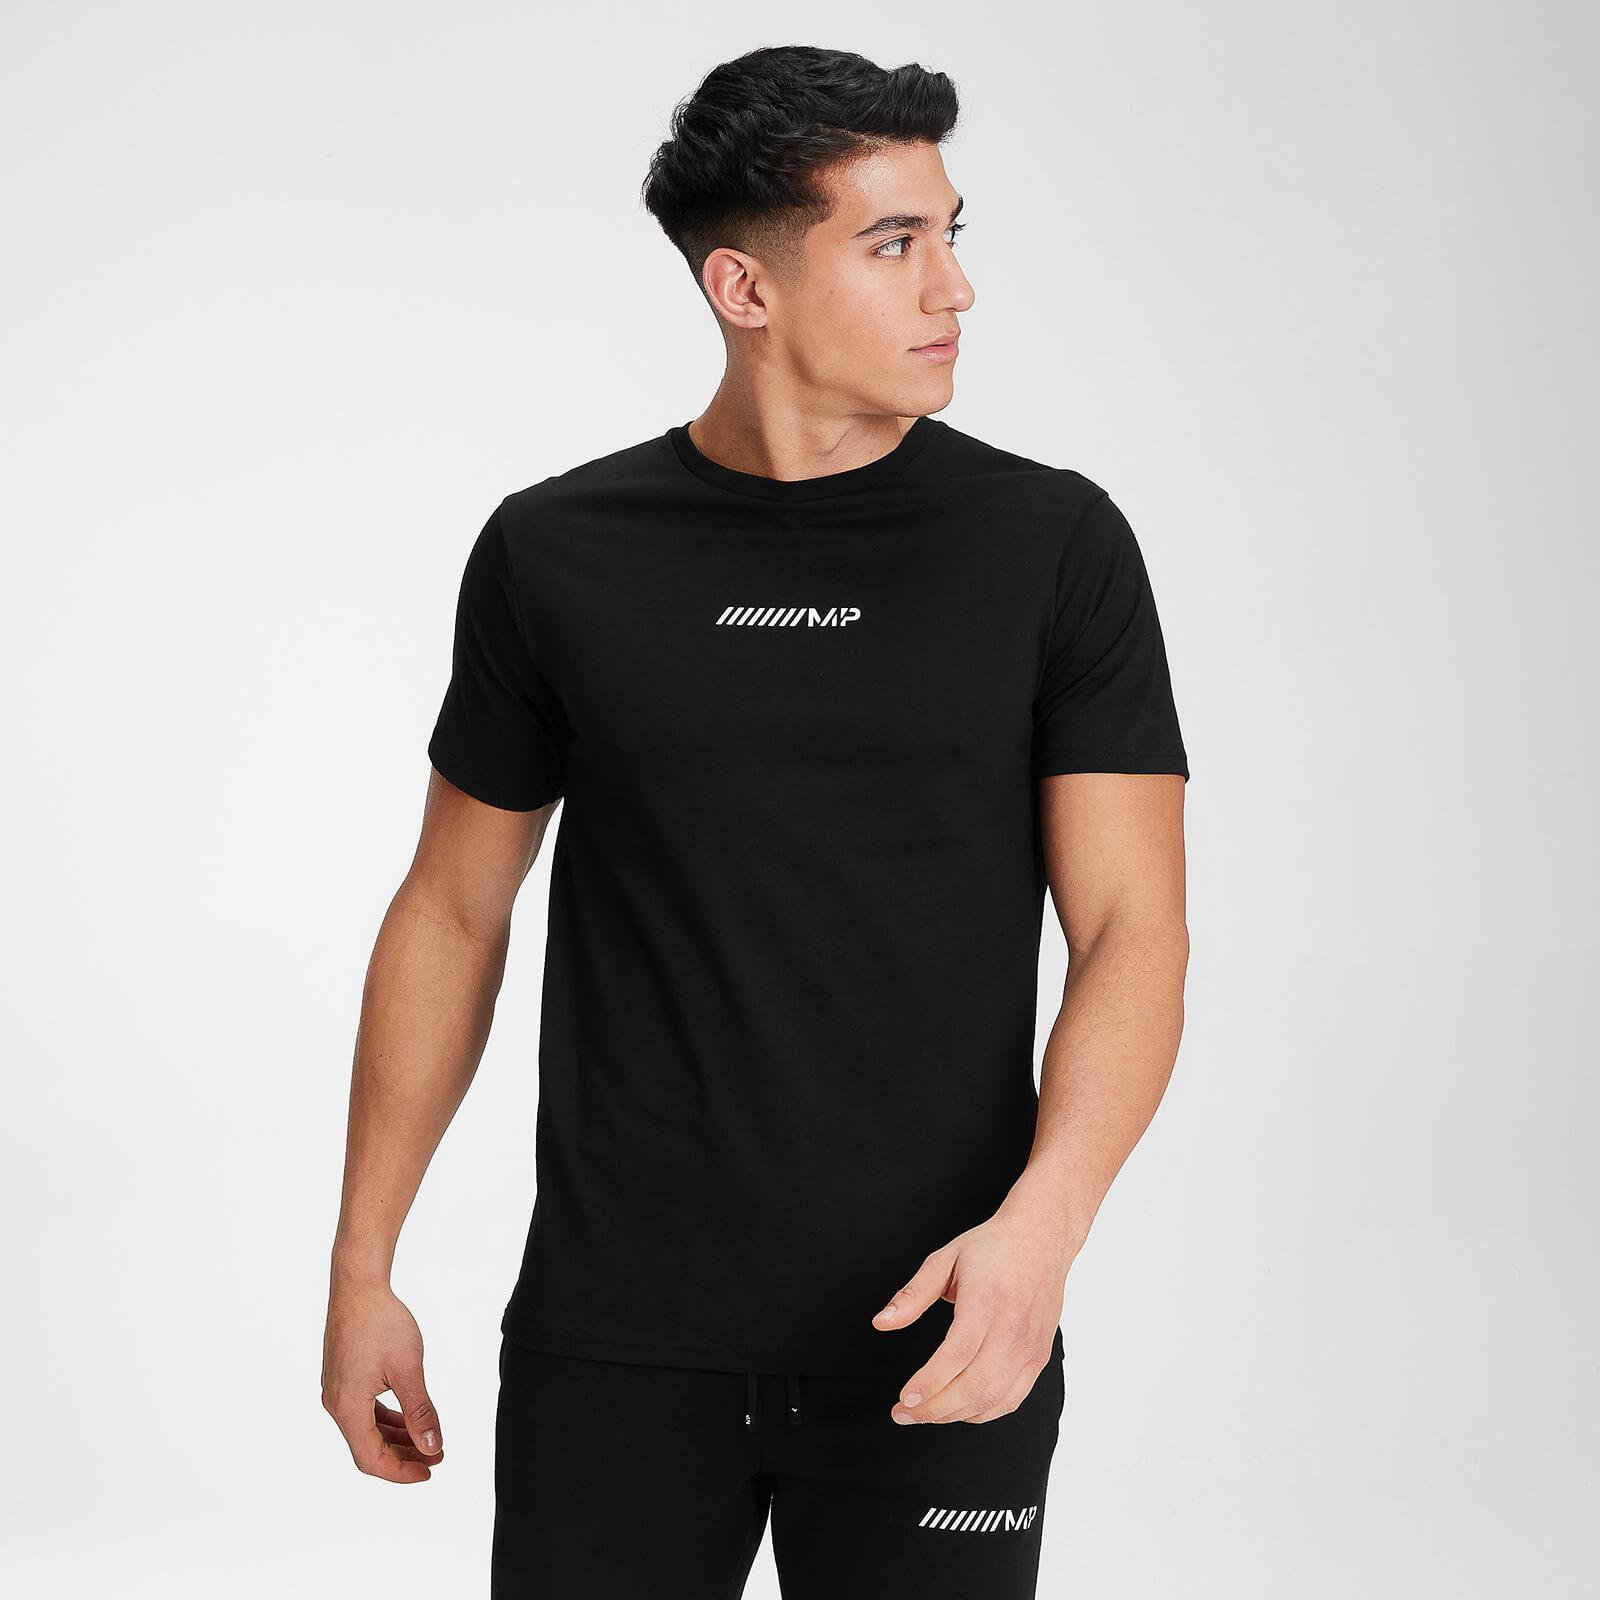 MP Men's Contrast Graphic Short Sleeve T-Shirt - Black - XXL